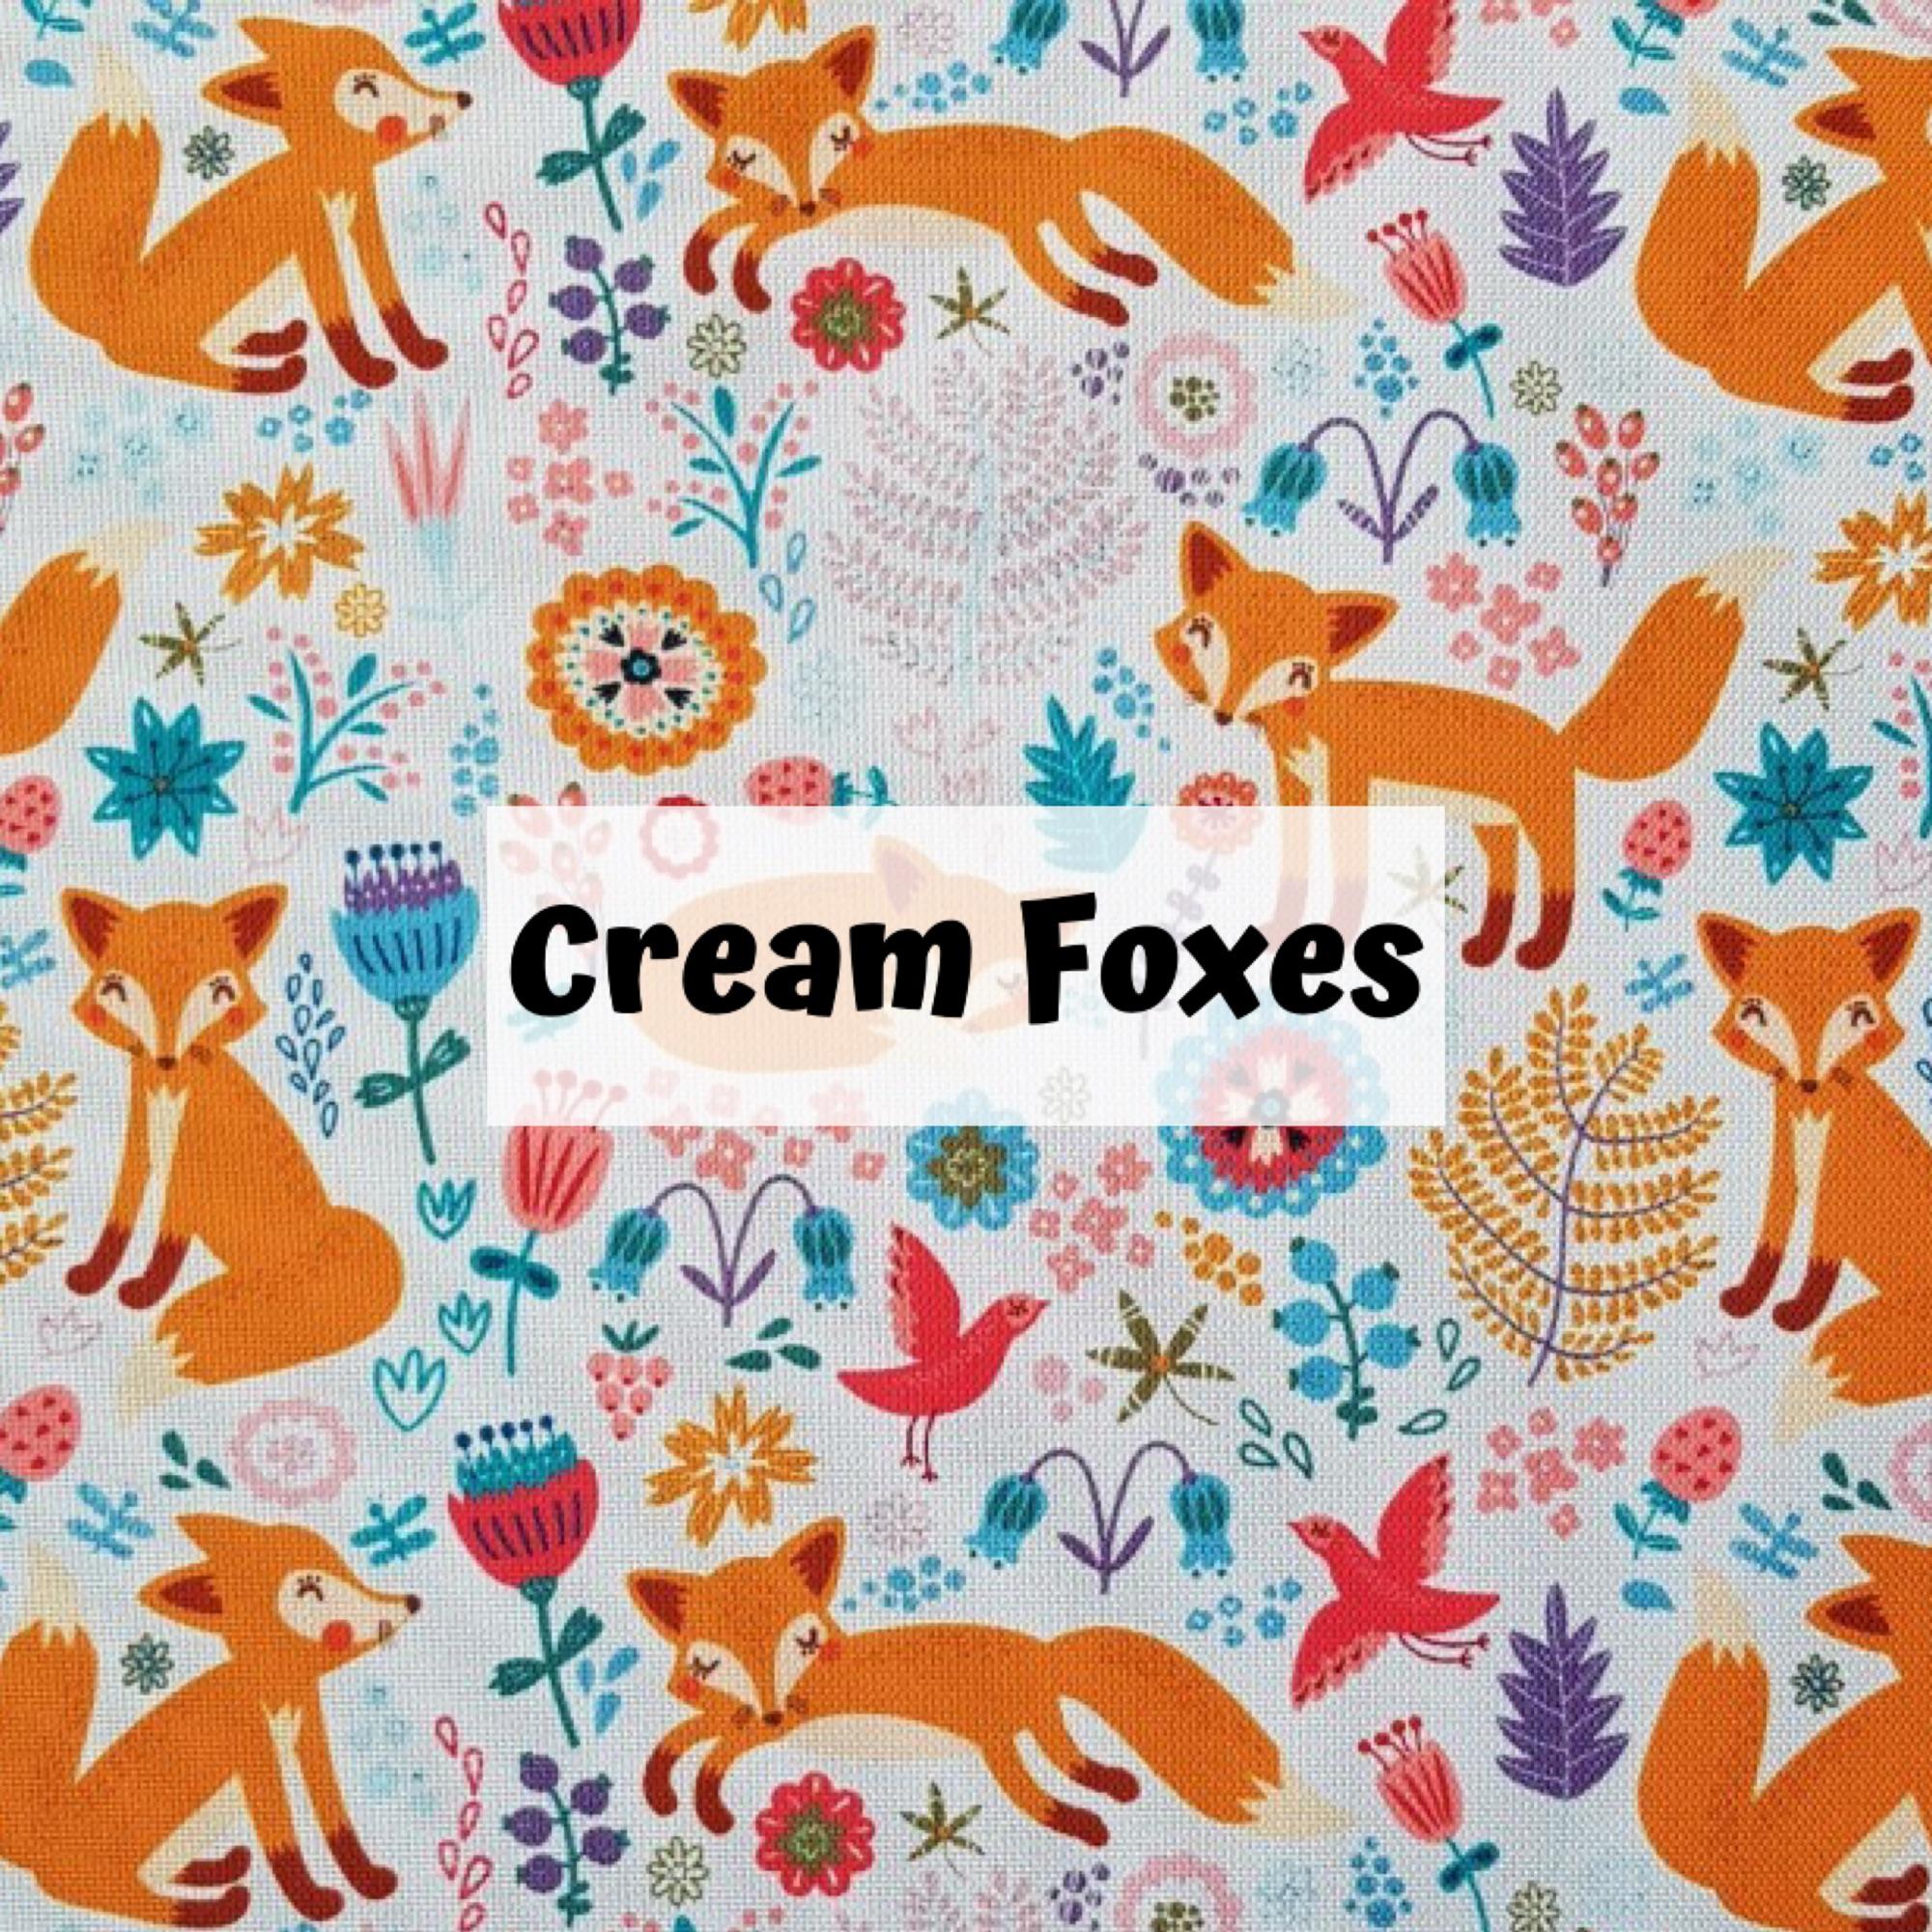 Cream Foxes